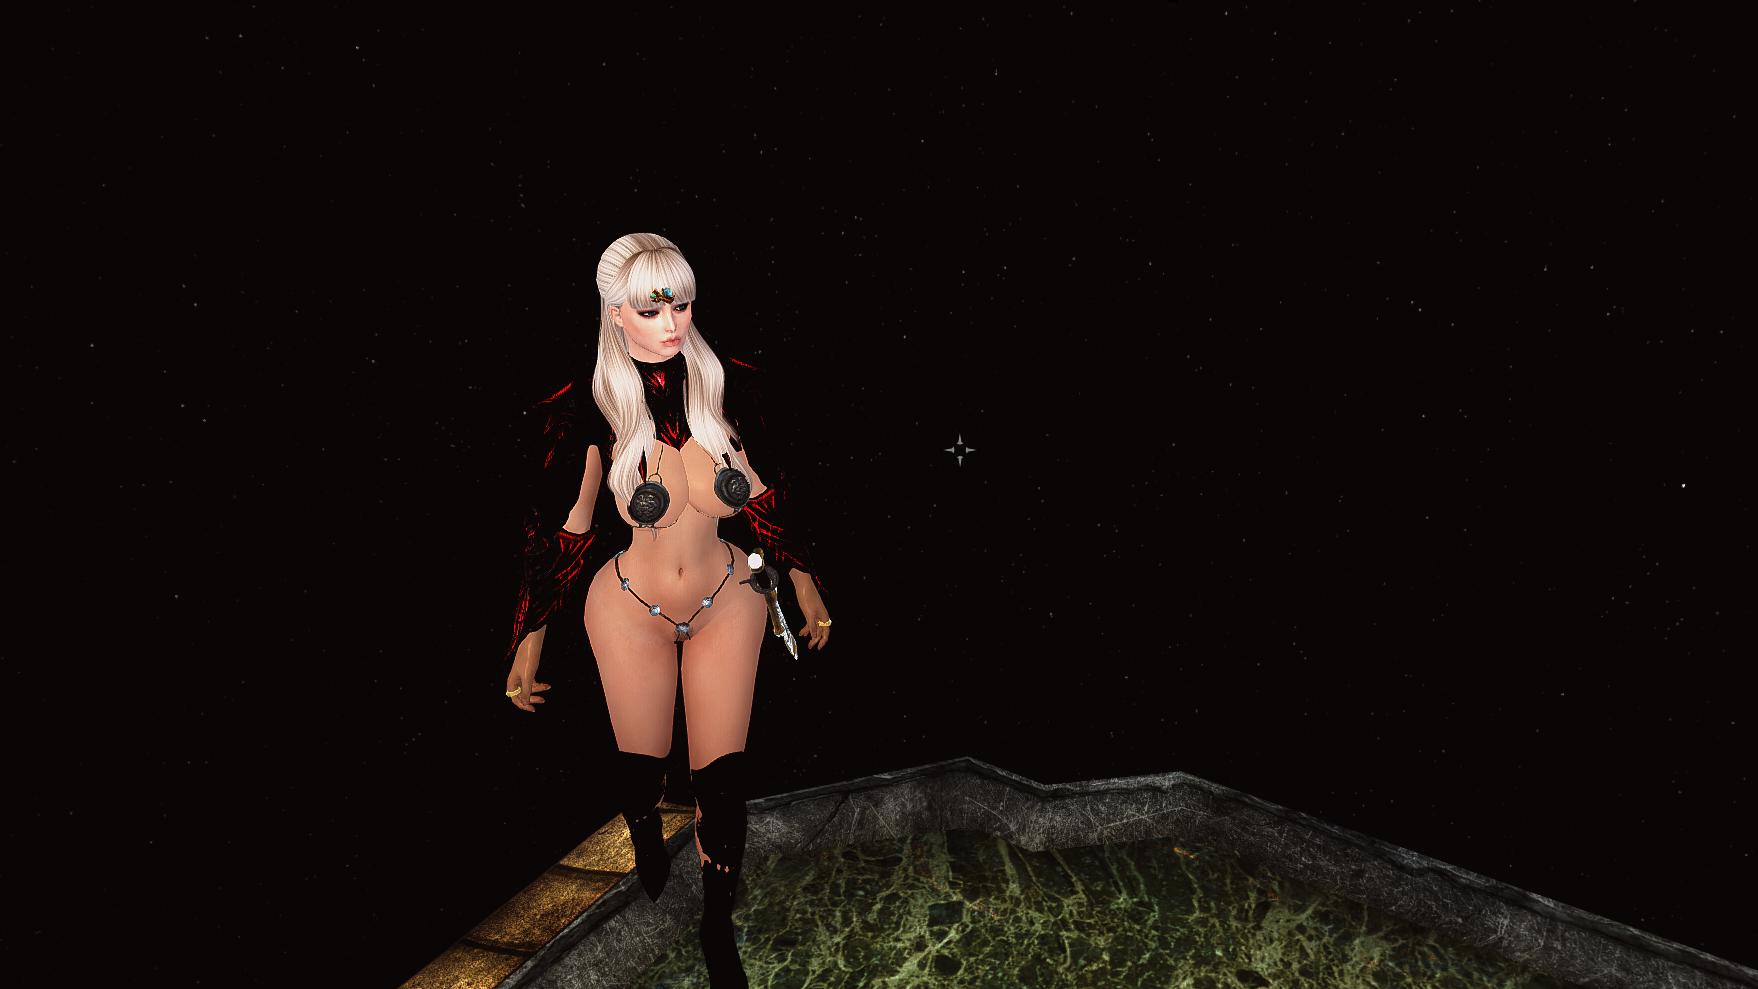 Tes V - Skyrim Screenshot 2018.06.22 - 18.32.19.43.png - Elder Scrolls 5: Skyrim, the